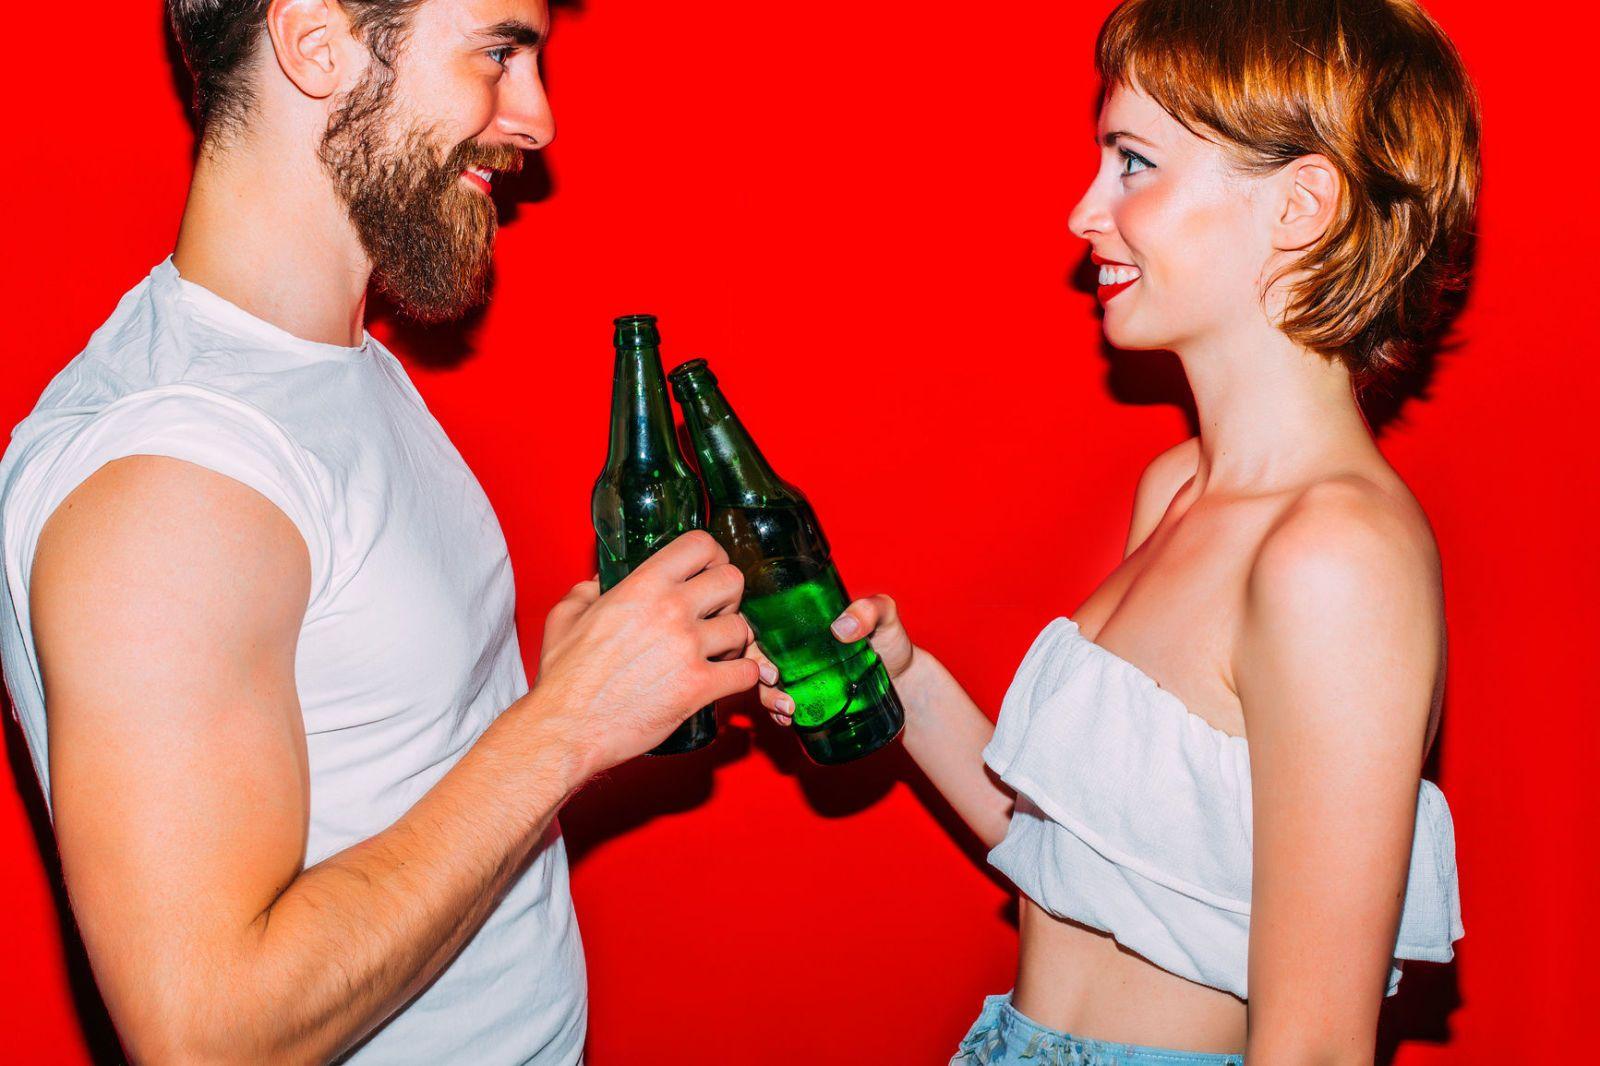 Decoding male dating behavior